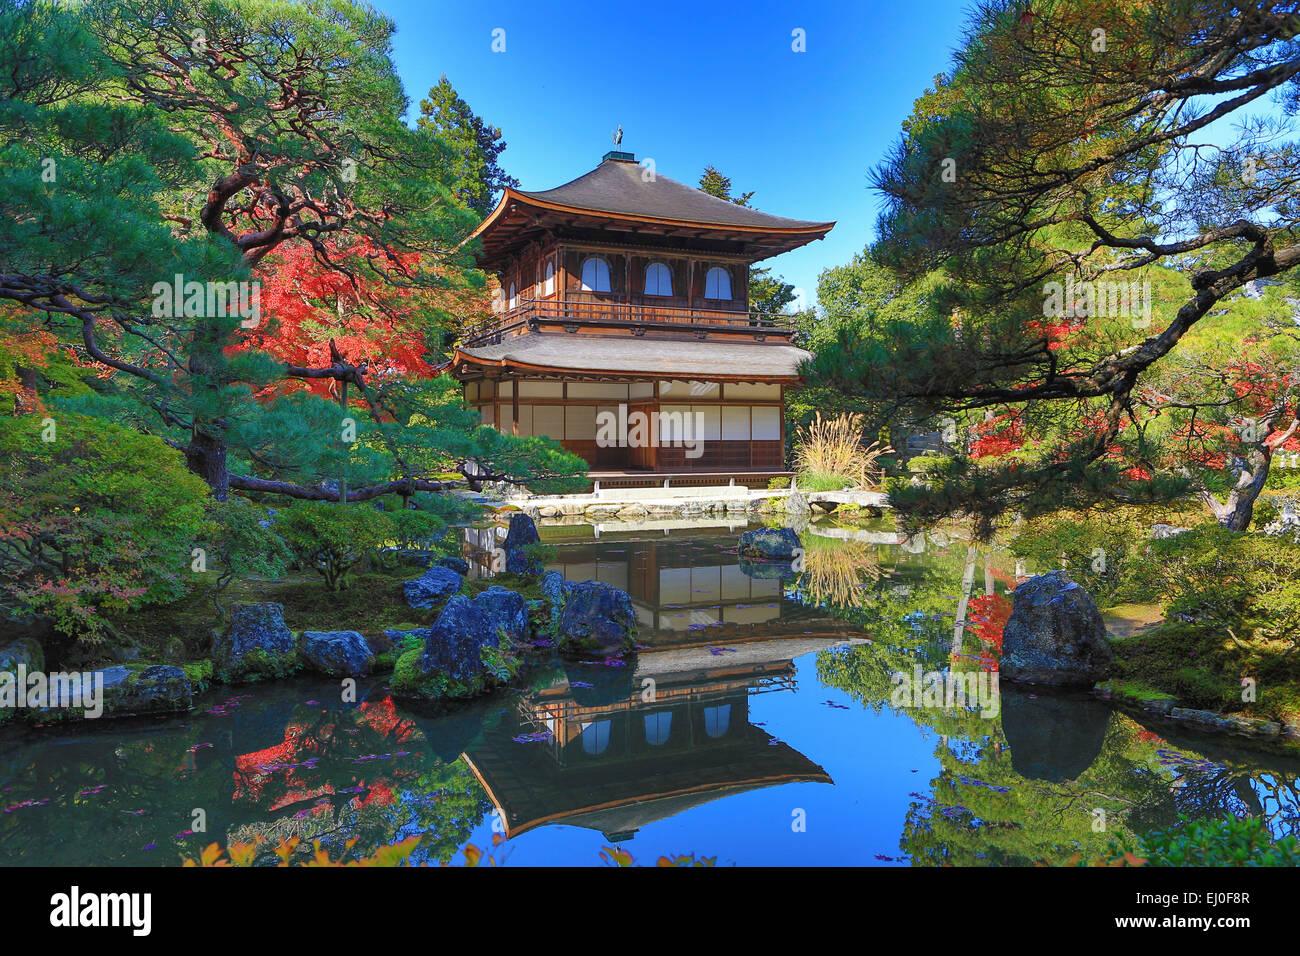 Patrimonio de la humanidad, el Ginkaku-ji, Japón, Asia, Kansai, Kyoto, Japón, paisaje, arquitectura, colorido, Imagen De Stock